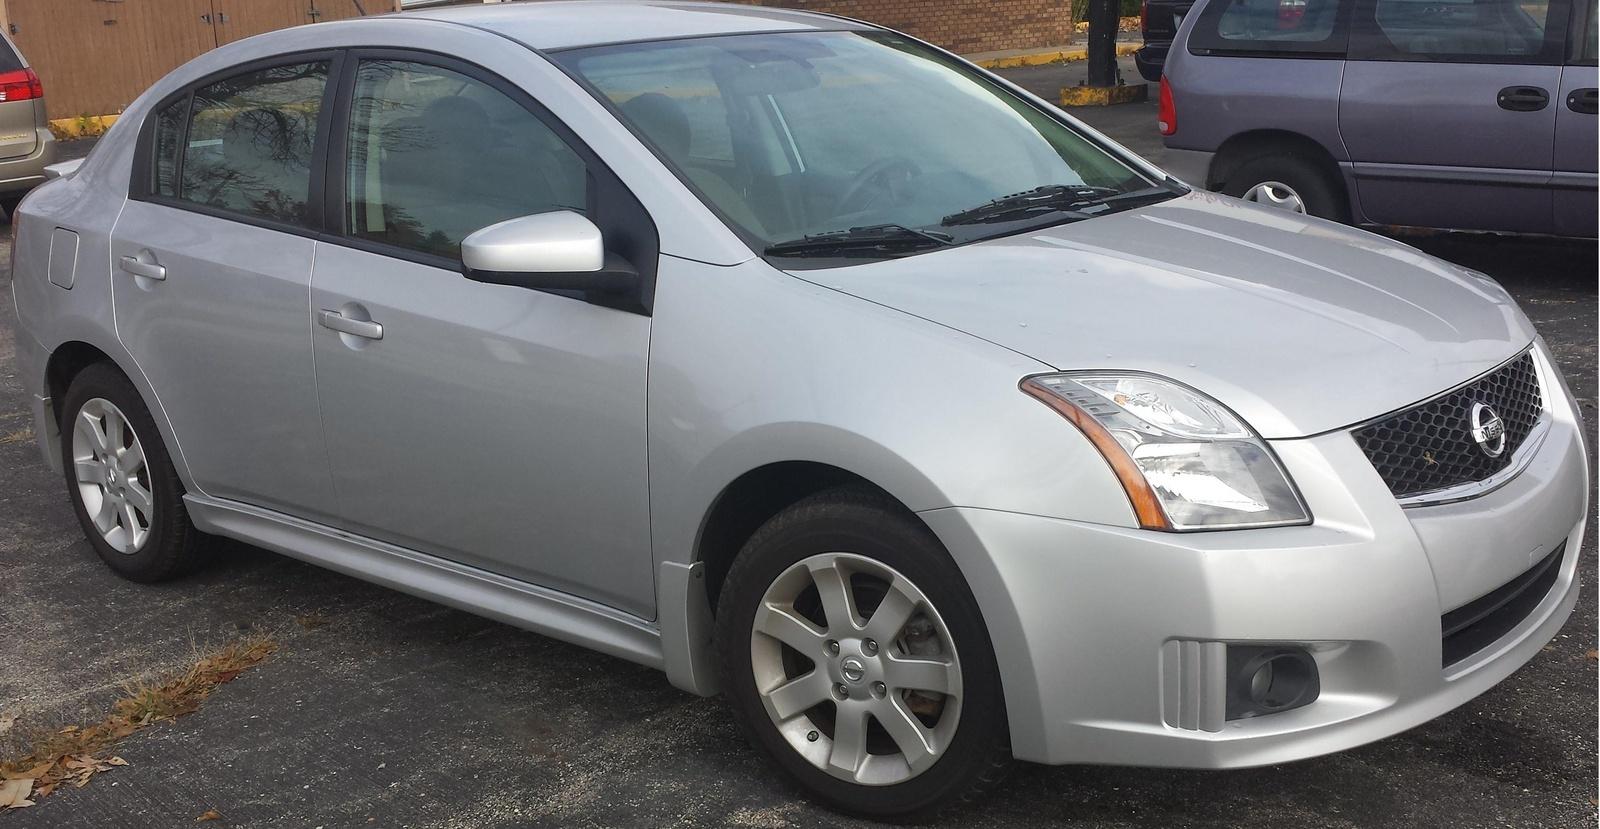 Used Car Values Edmunds >> 2009 Nissan Sentra Reviews | Autos Post